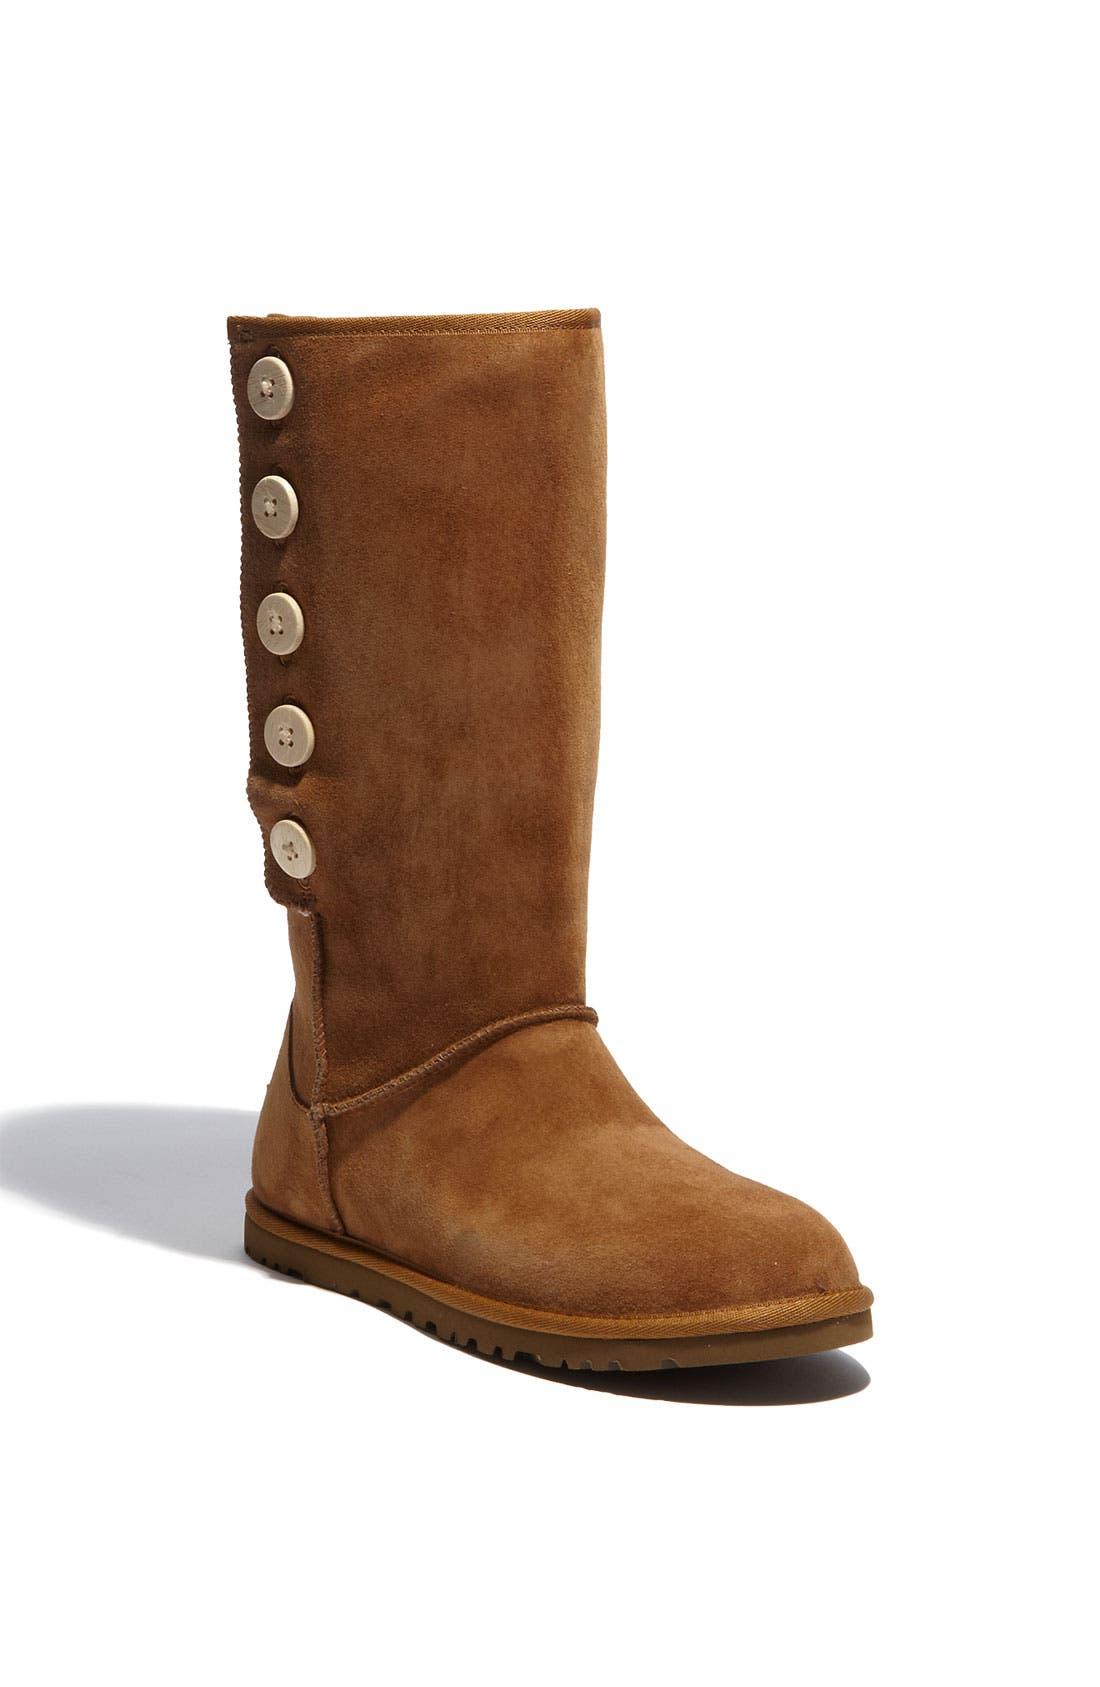 Main Image - UGG® Australia 'Lo Pro' Suede Boot (Women)